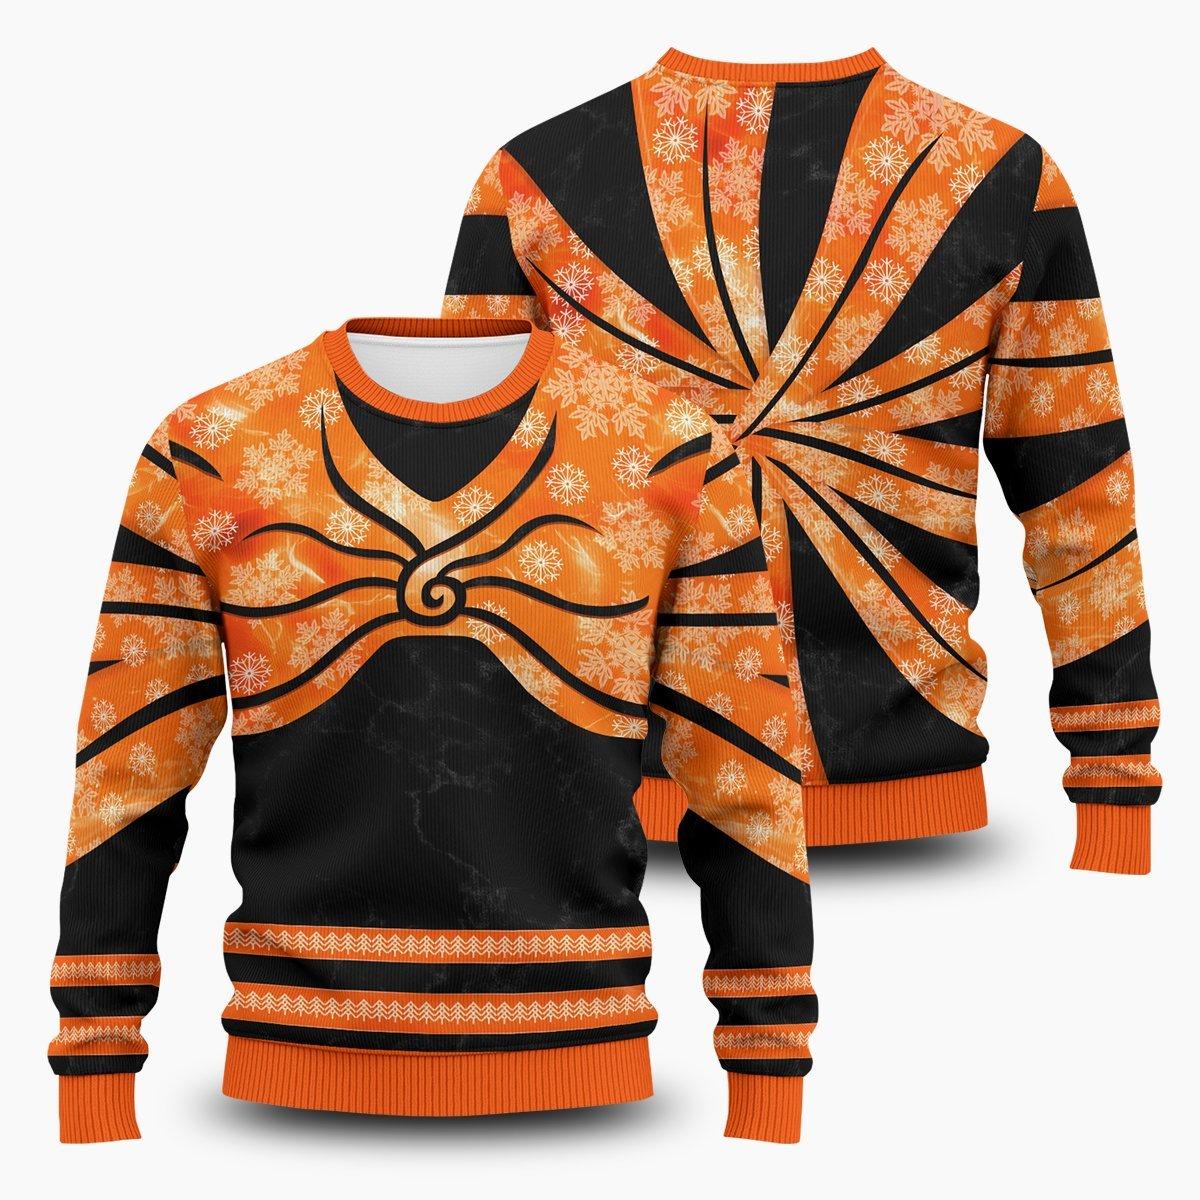 Baryon Mode Xmas Unisex Wool Sweater FDM0310 S Official Otaku Treat Merch